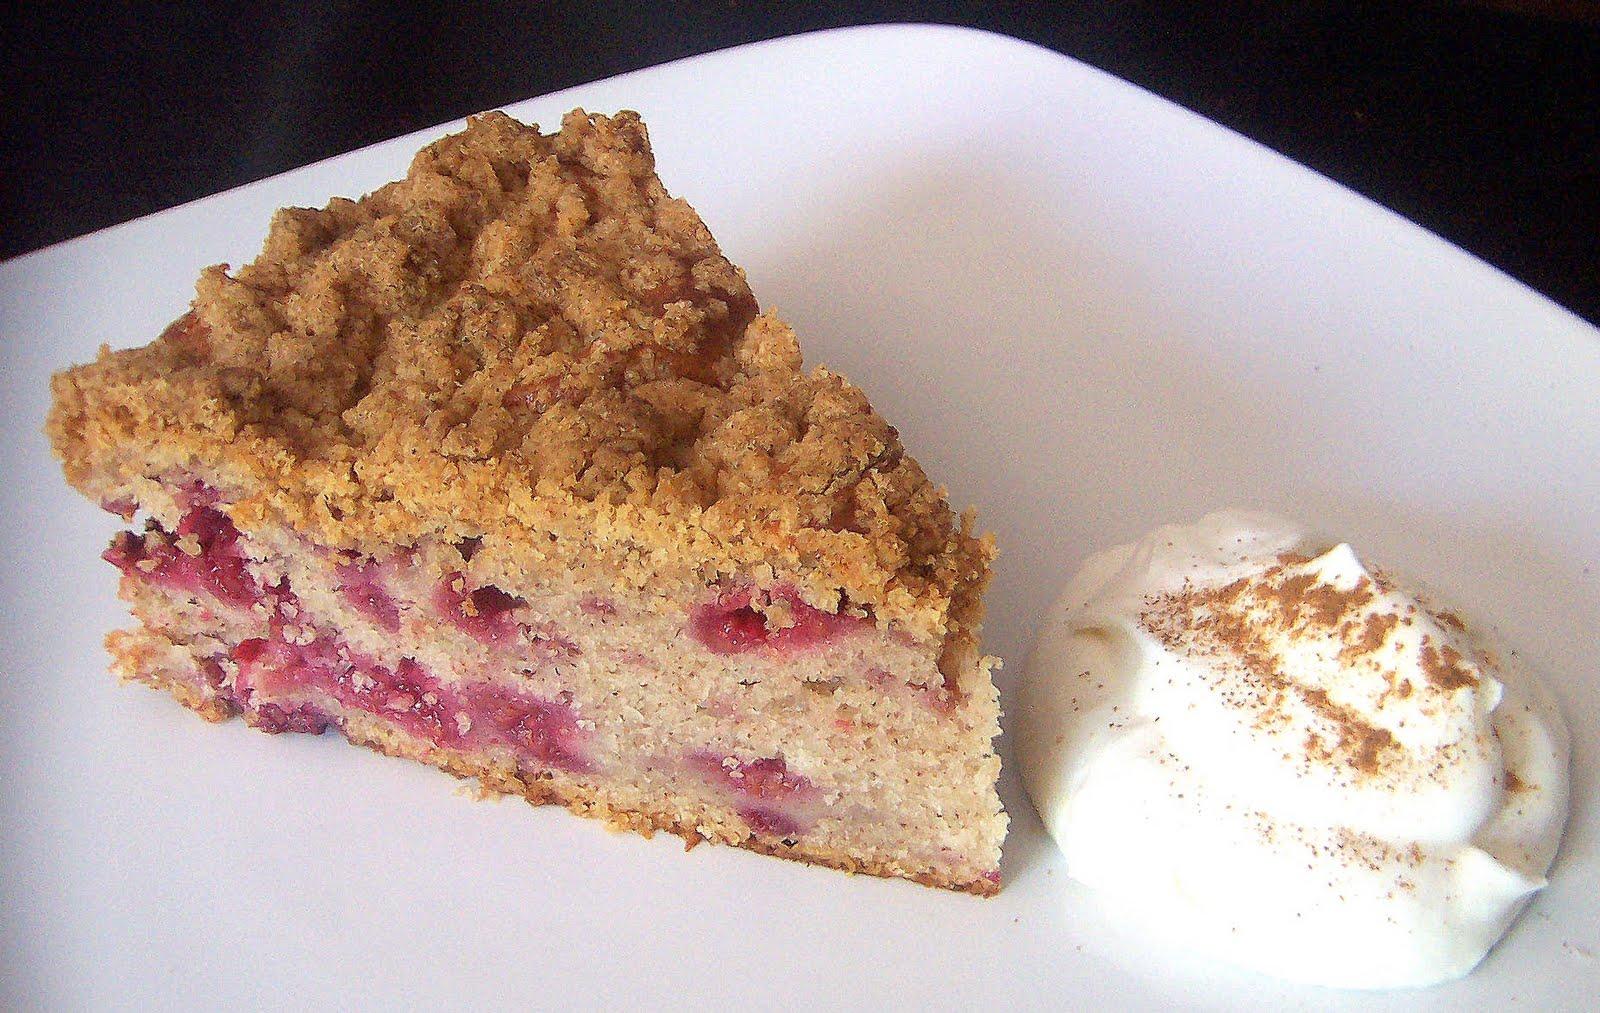 The Scone Gunman: Raspberry Crumb Cake